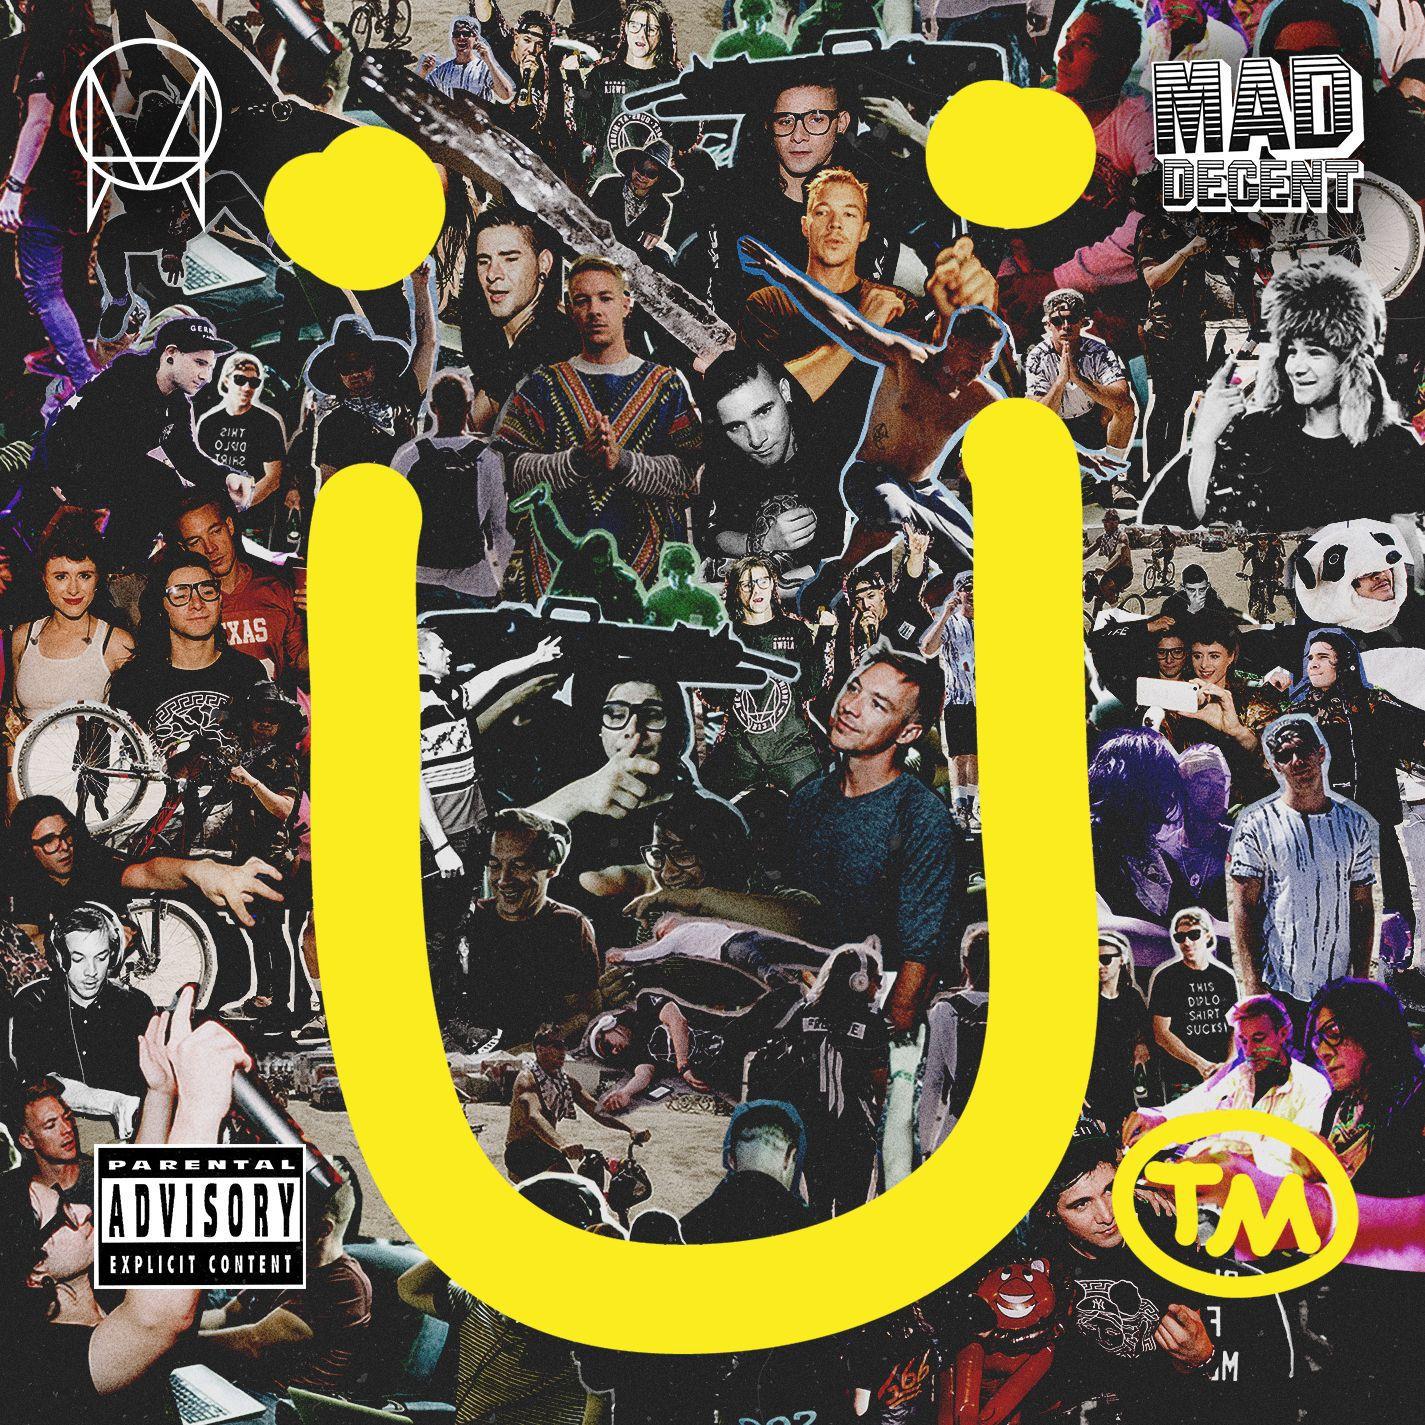 Skrillex - Skrillex & Diplo Present Jack U album cover